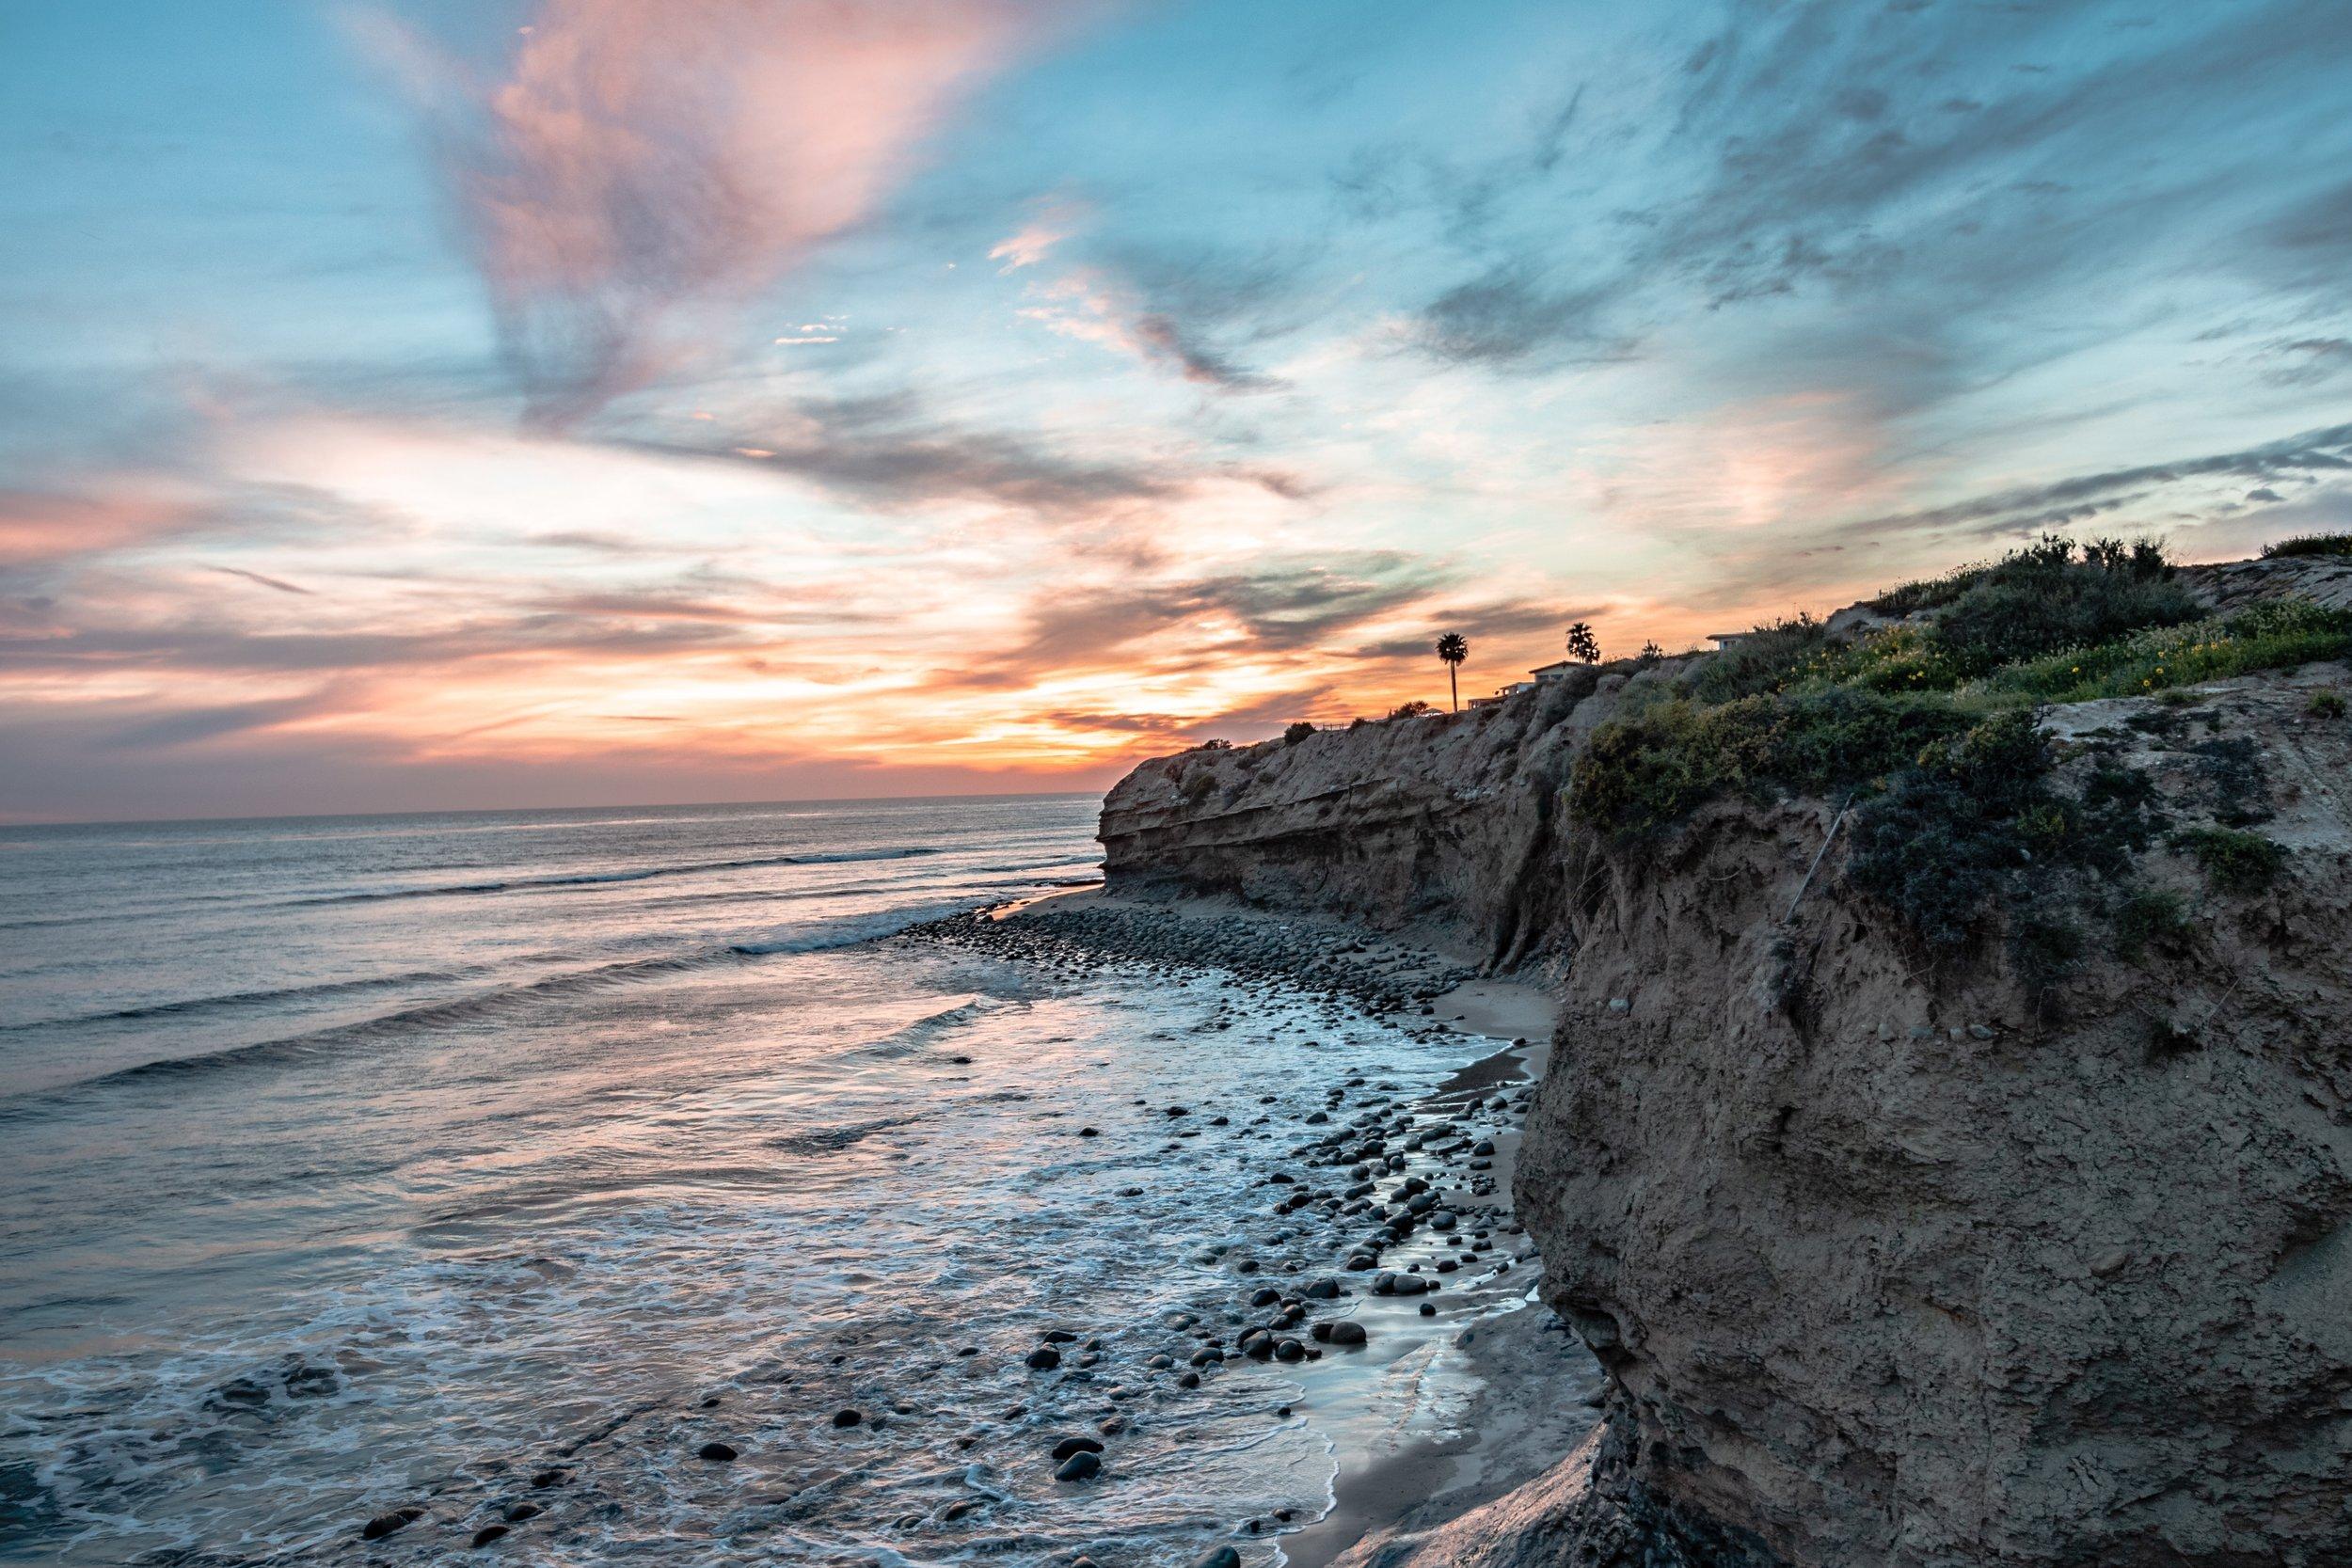 rocky beach on the baja coast at sunset